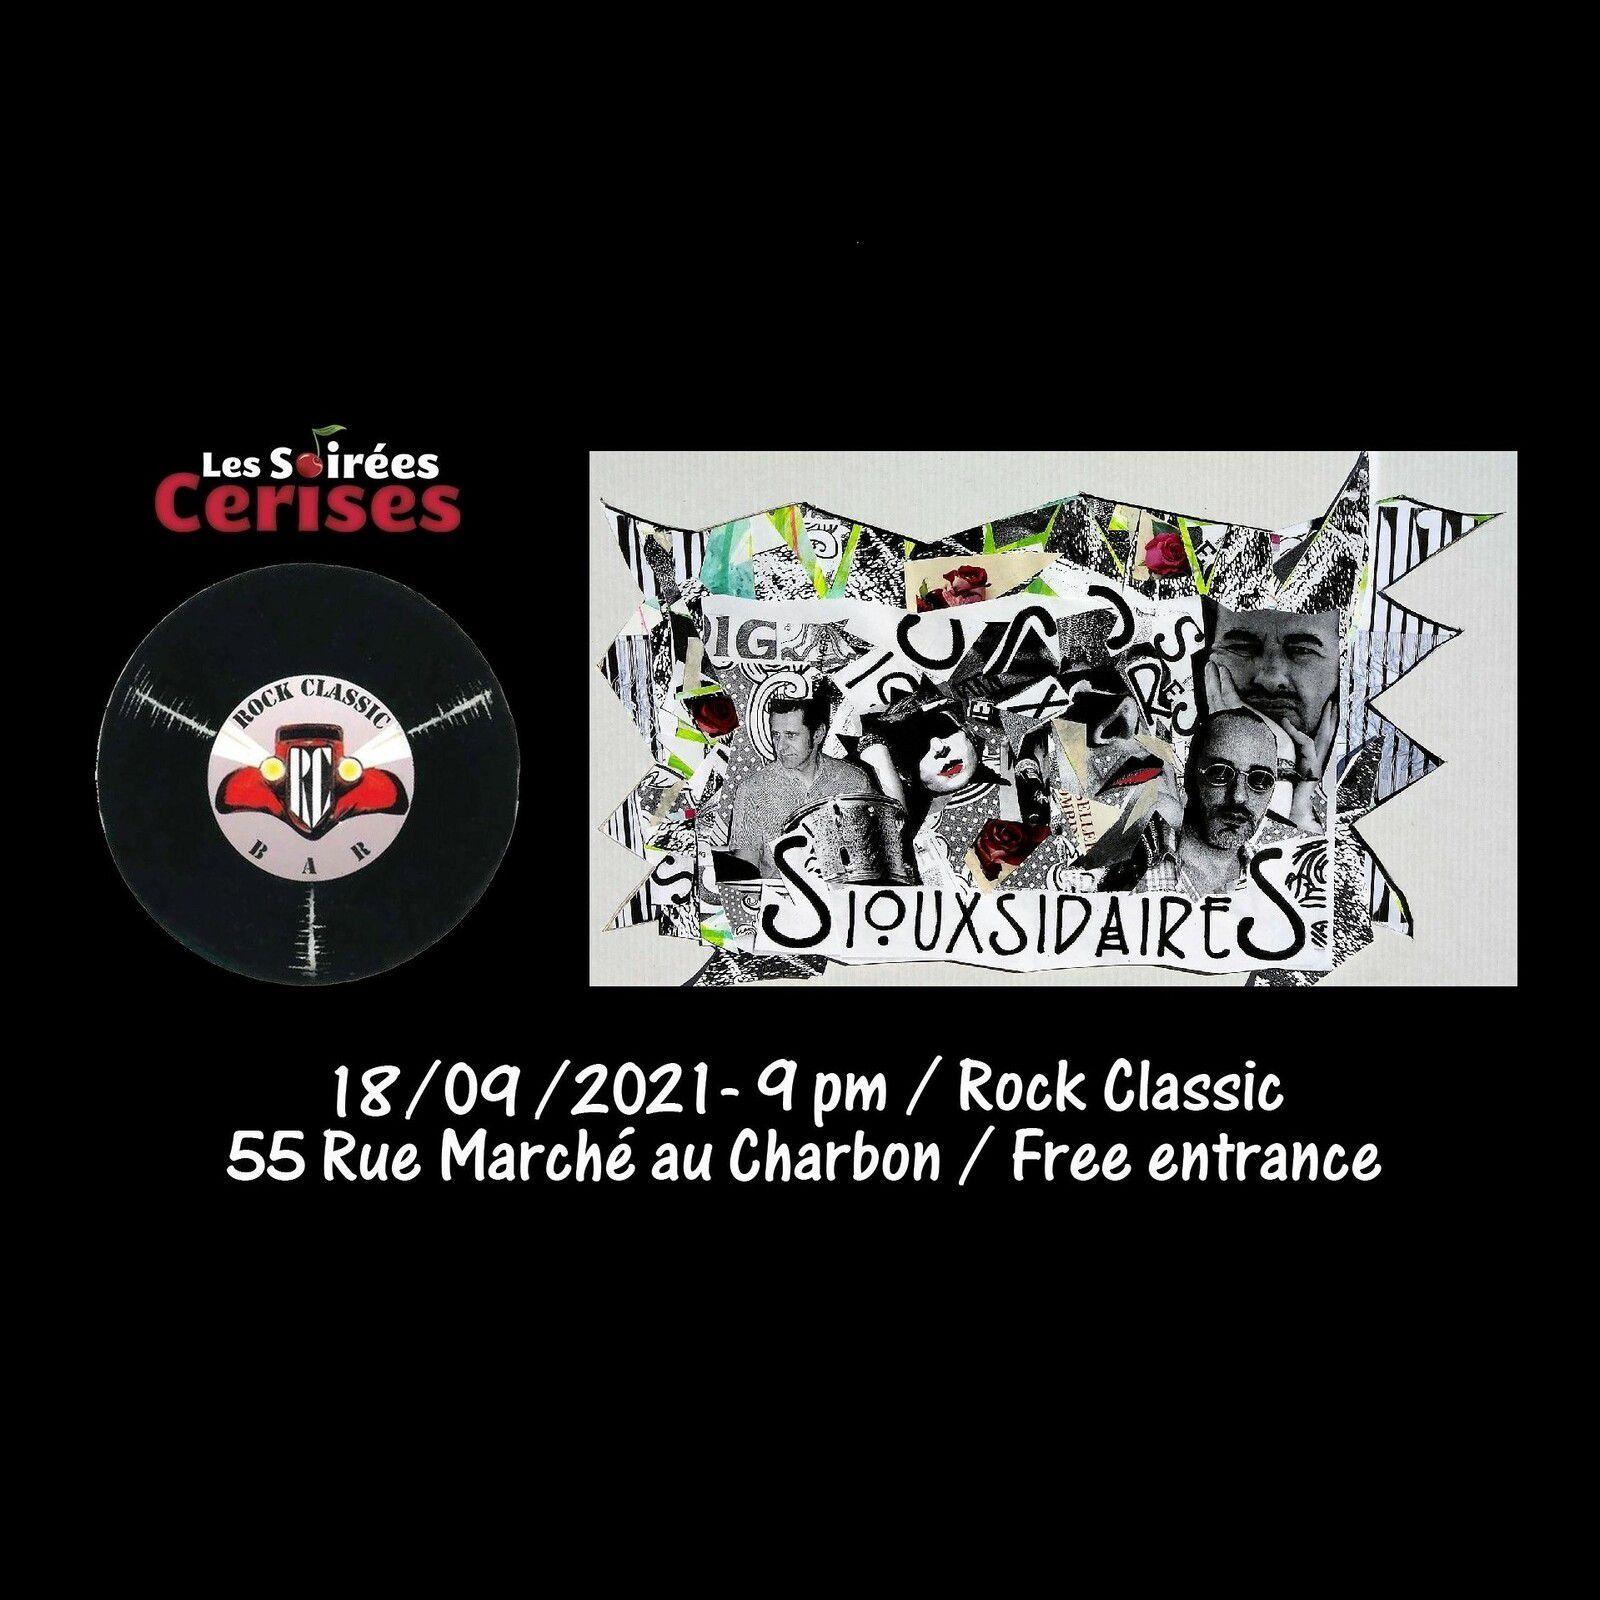 🎵 Siouxsidaires (Siouxsie & the Banshees tribute band) @ Rock Classic - 18/09/2021 - 21h00 - Entrée gratuite / Free entrance